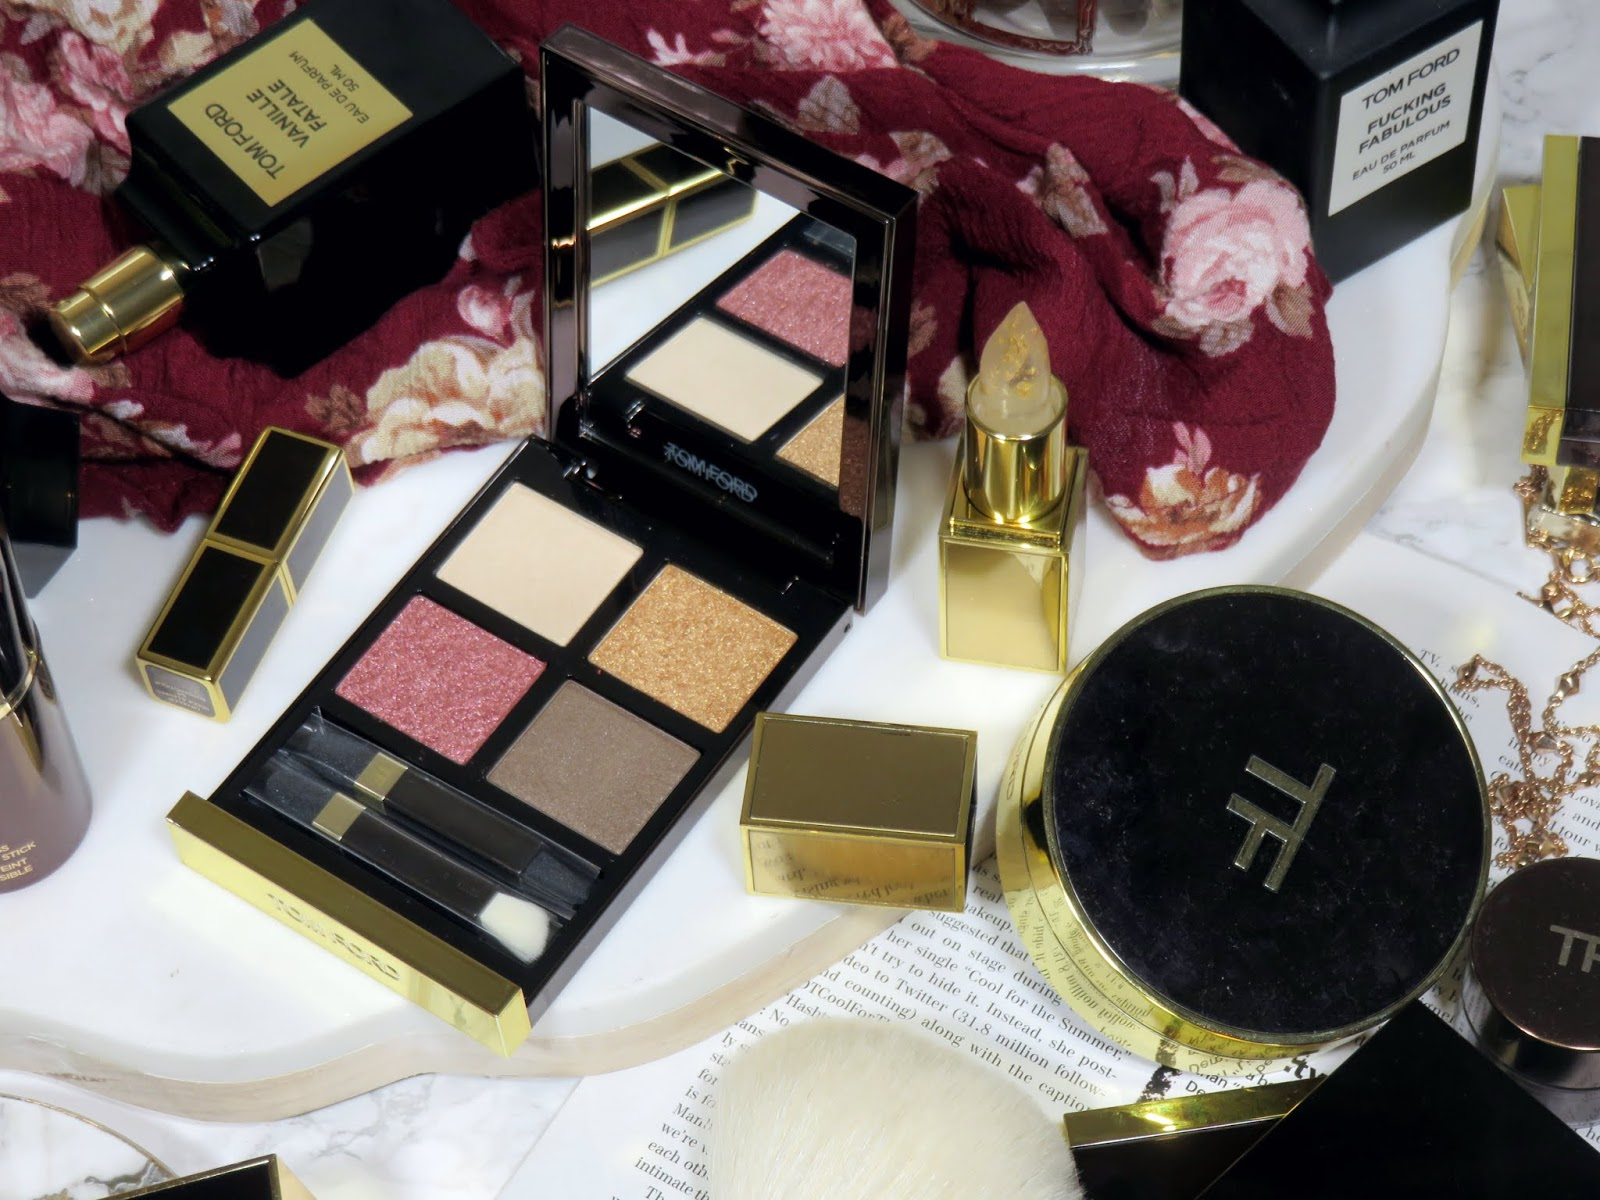 Tom Ford Arabesque Eye Color Quad Review & Swatches